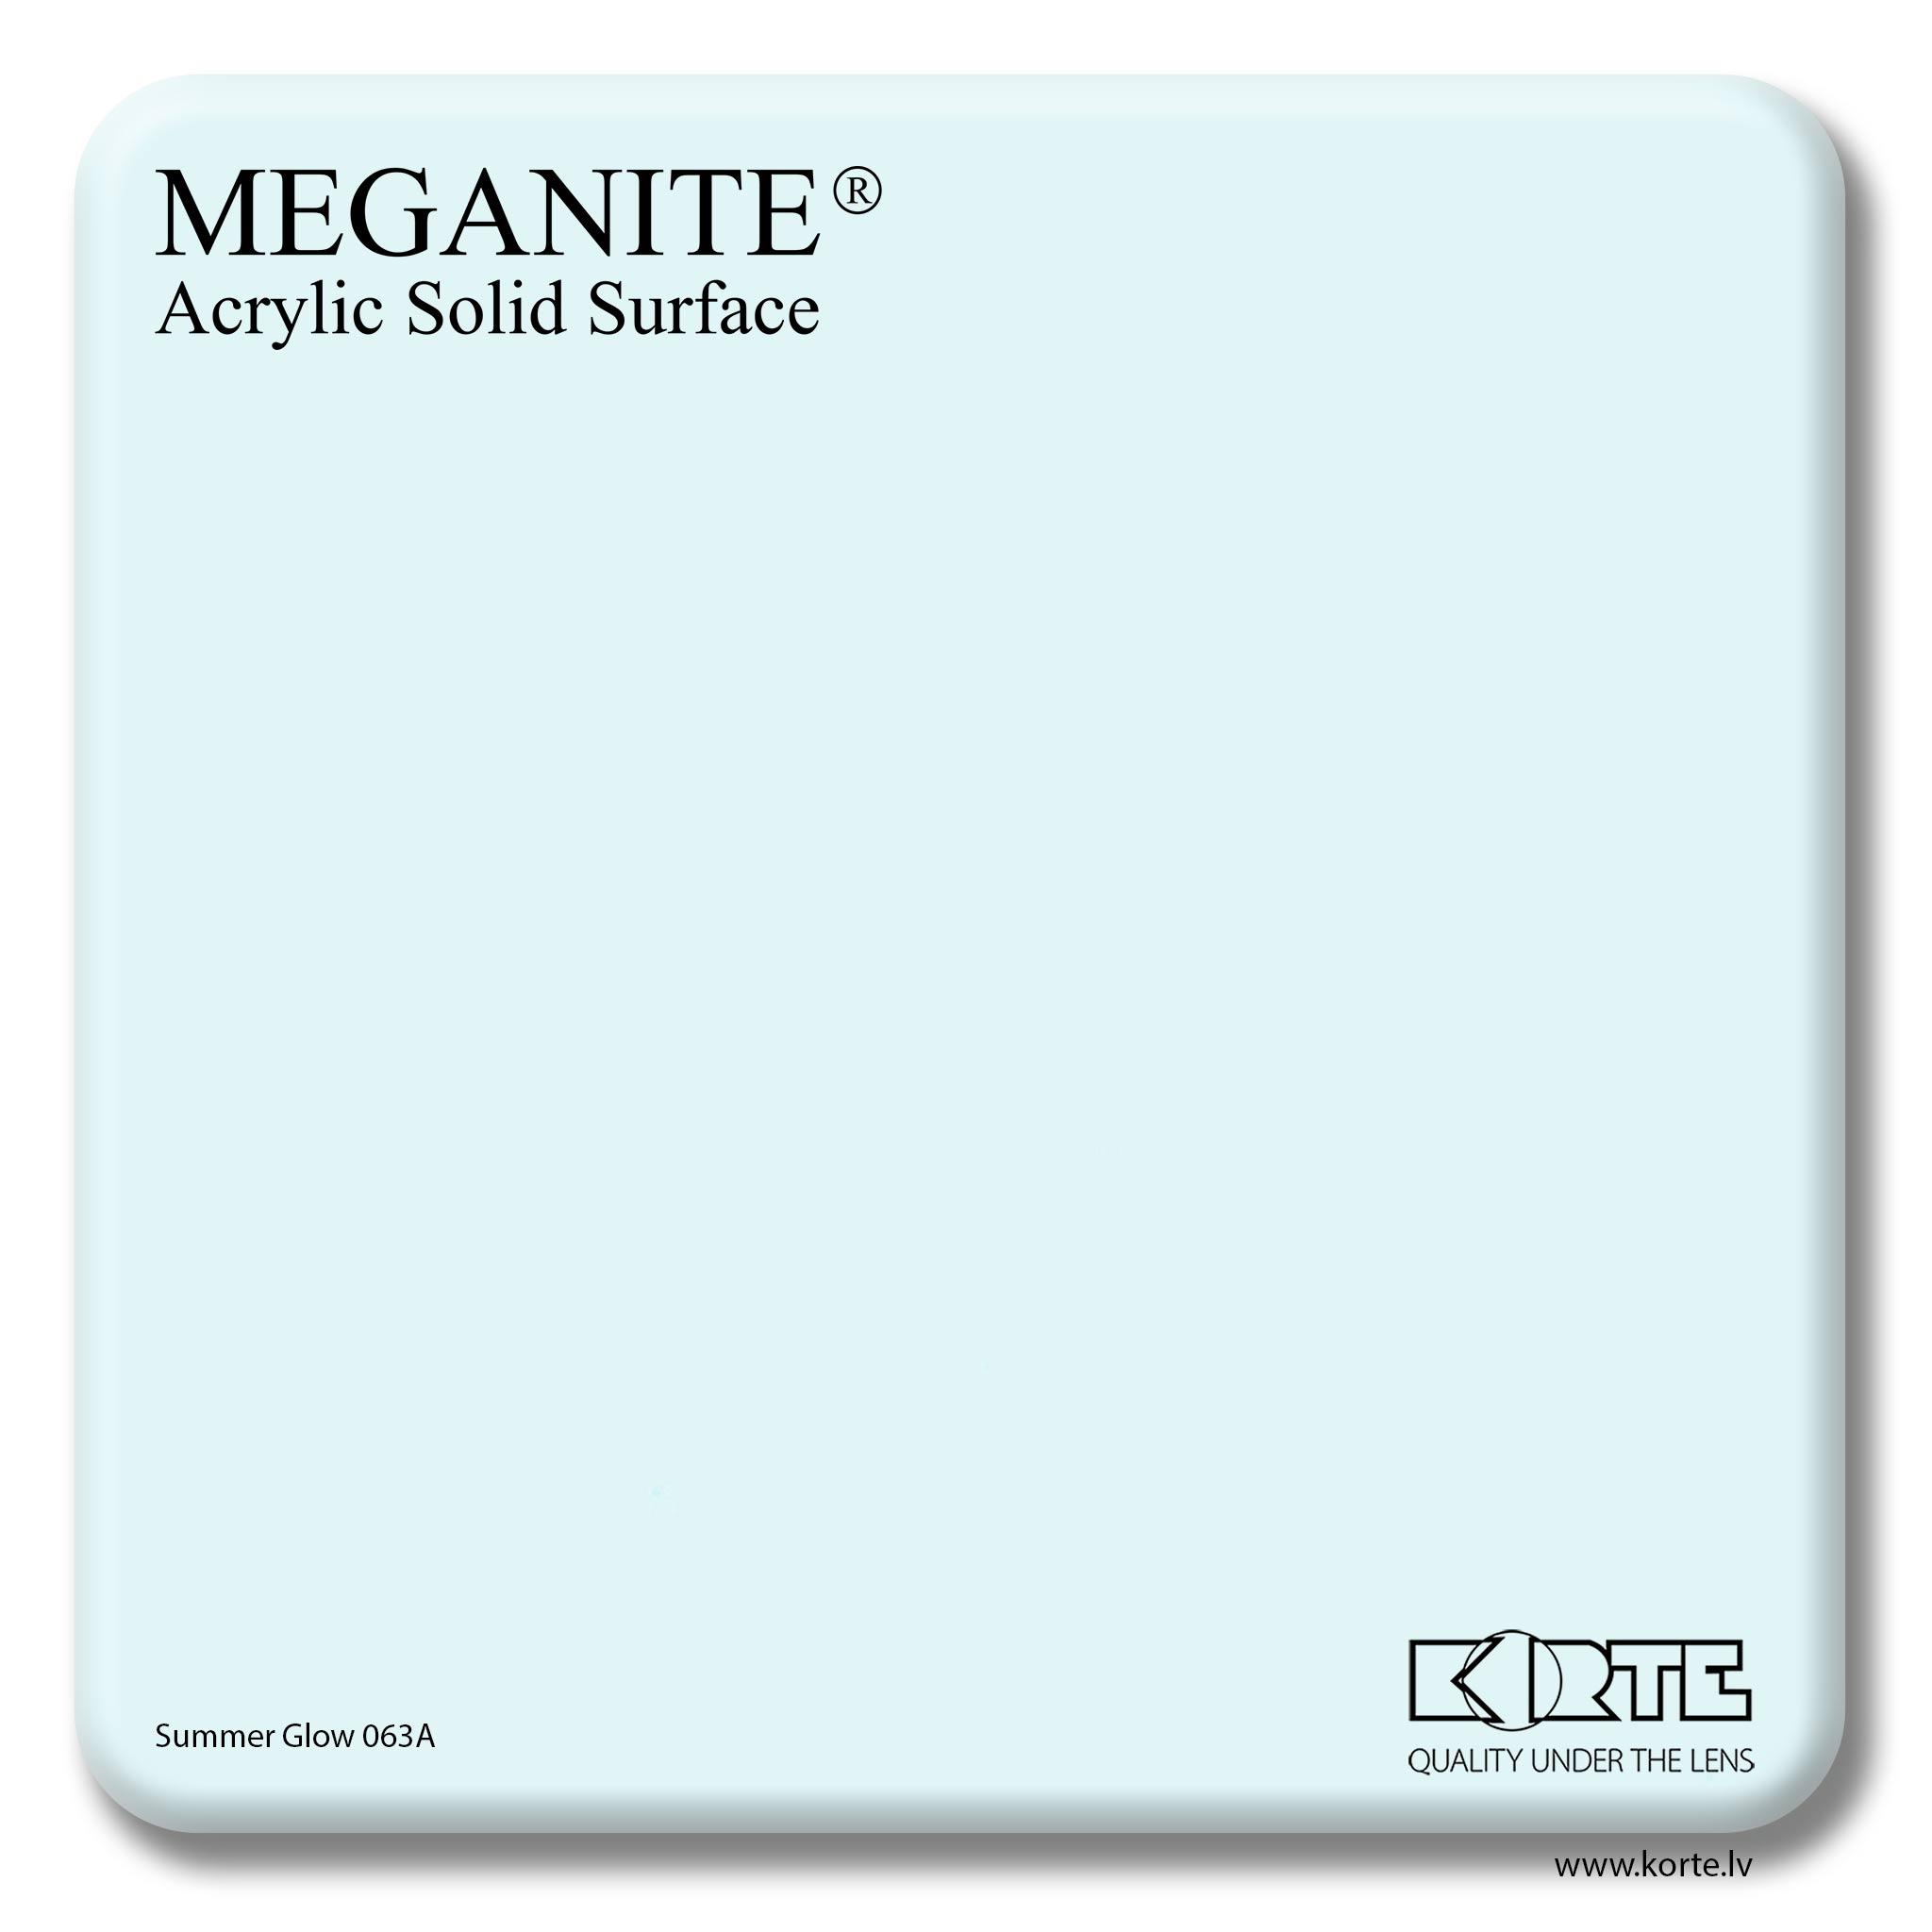 Meganite Summer Glow 063A